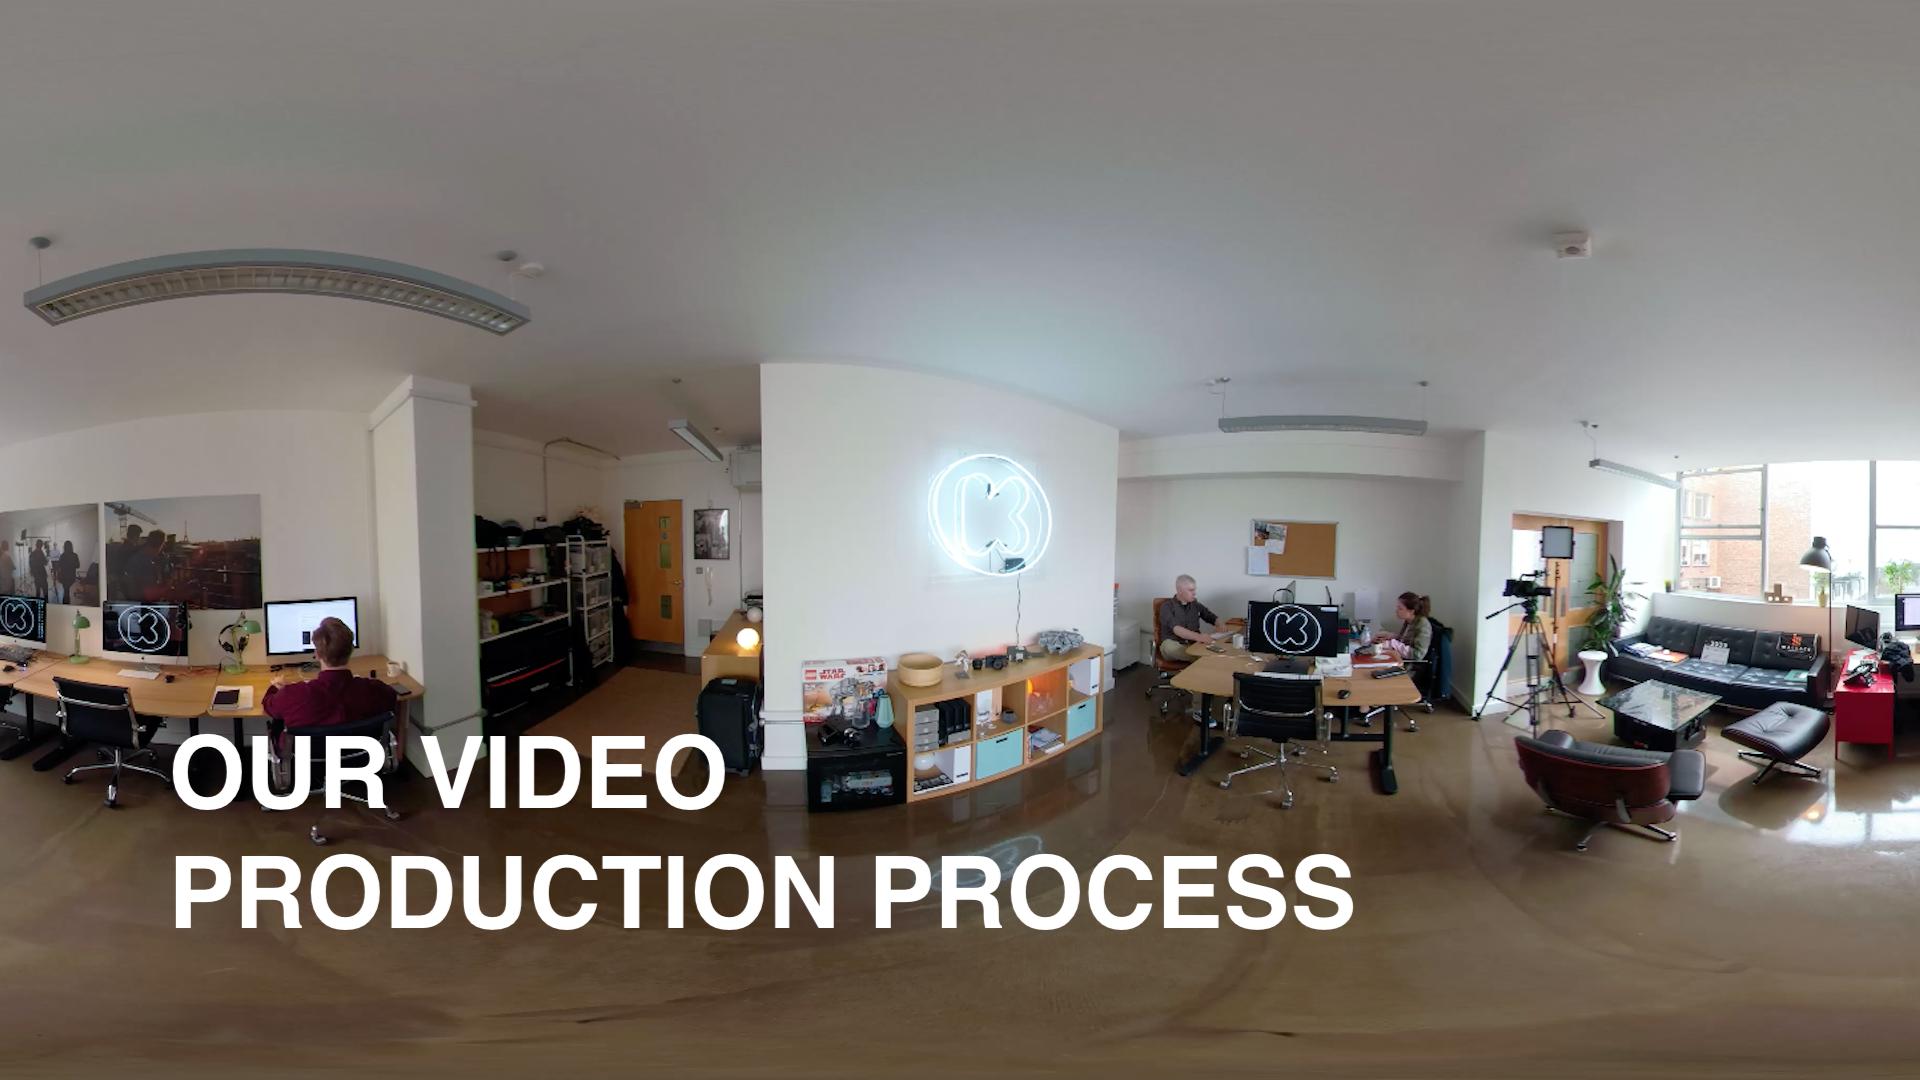 KARTOFFEL FILMS VIDEO PRODUCTION AGENCY LONDON